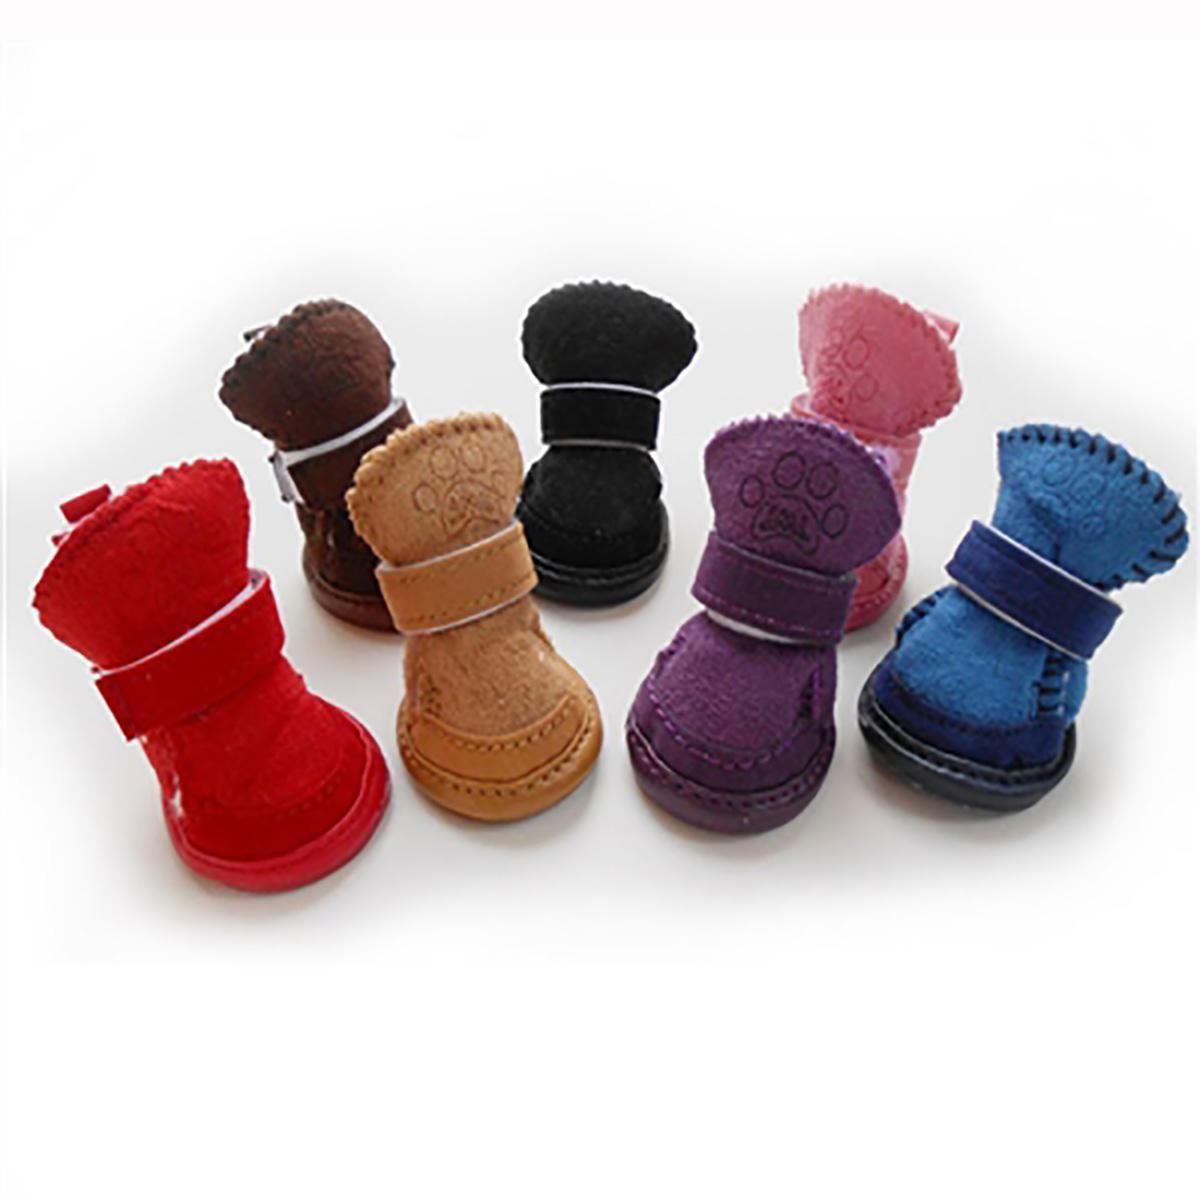 Pawgglys Dog Boots - Black